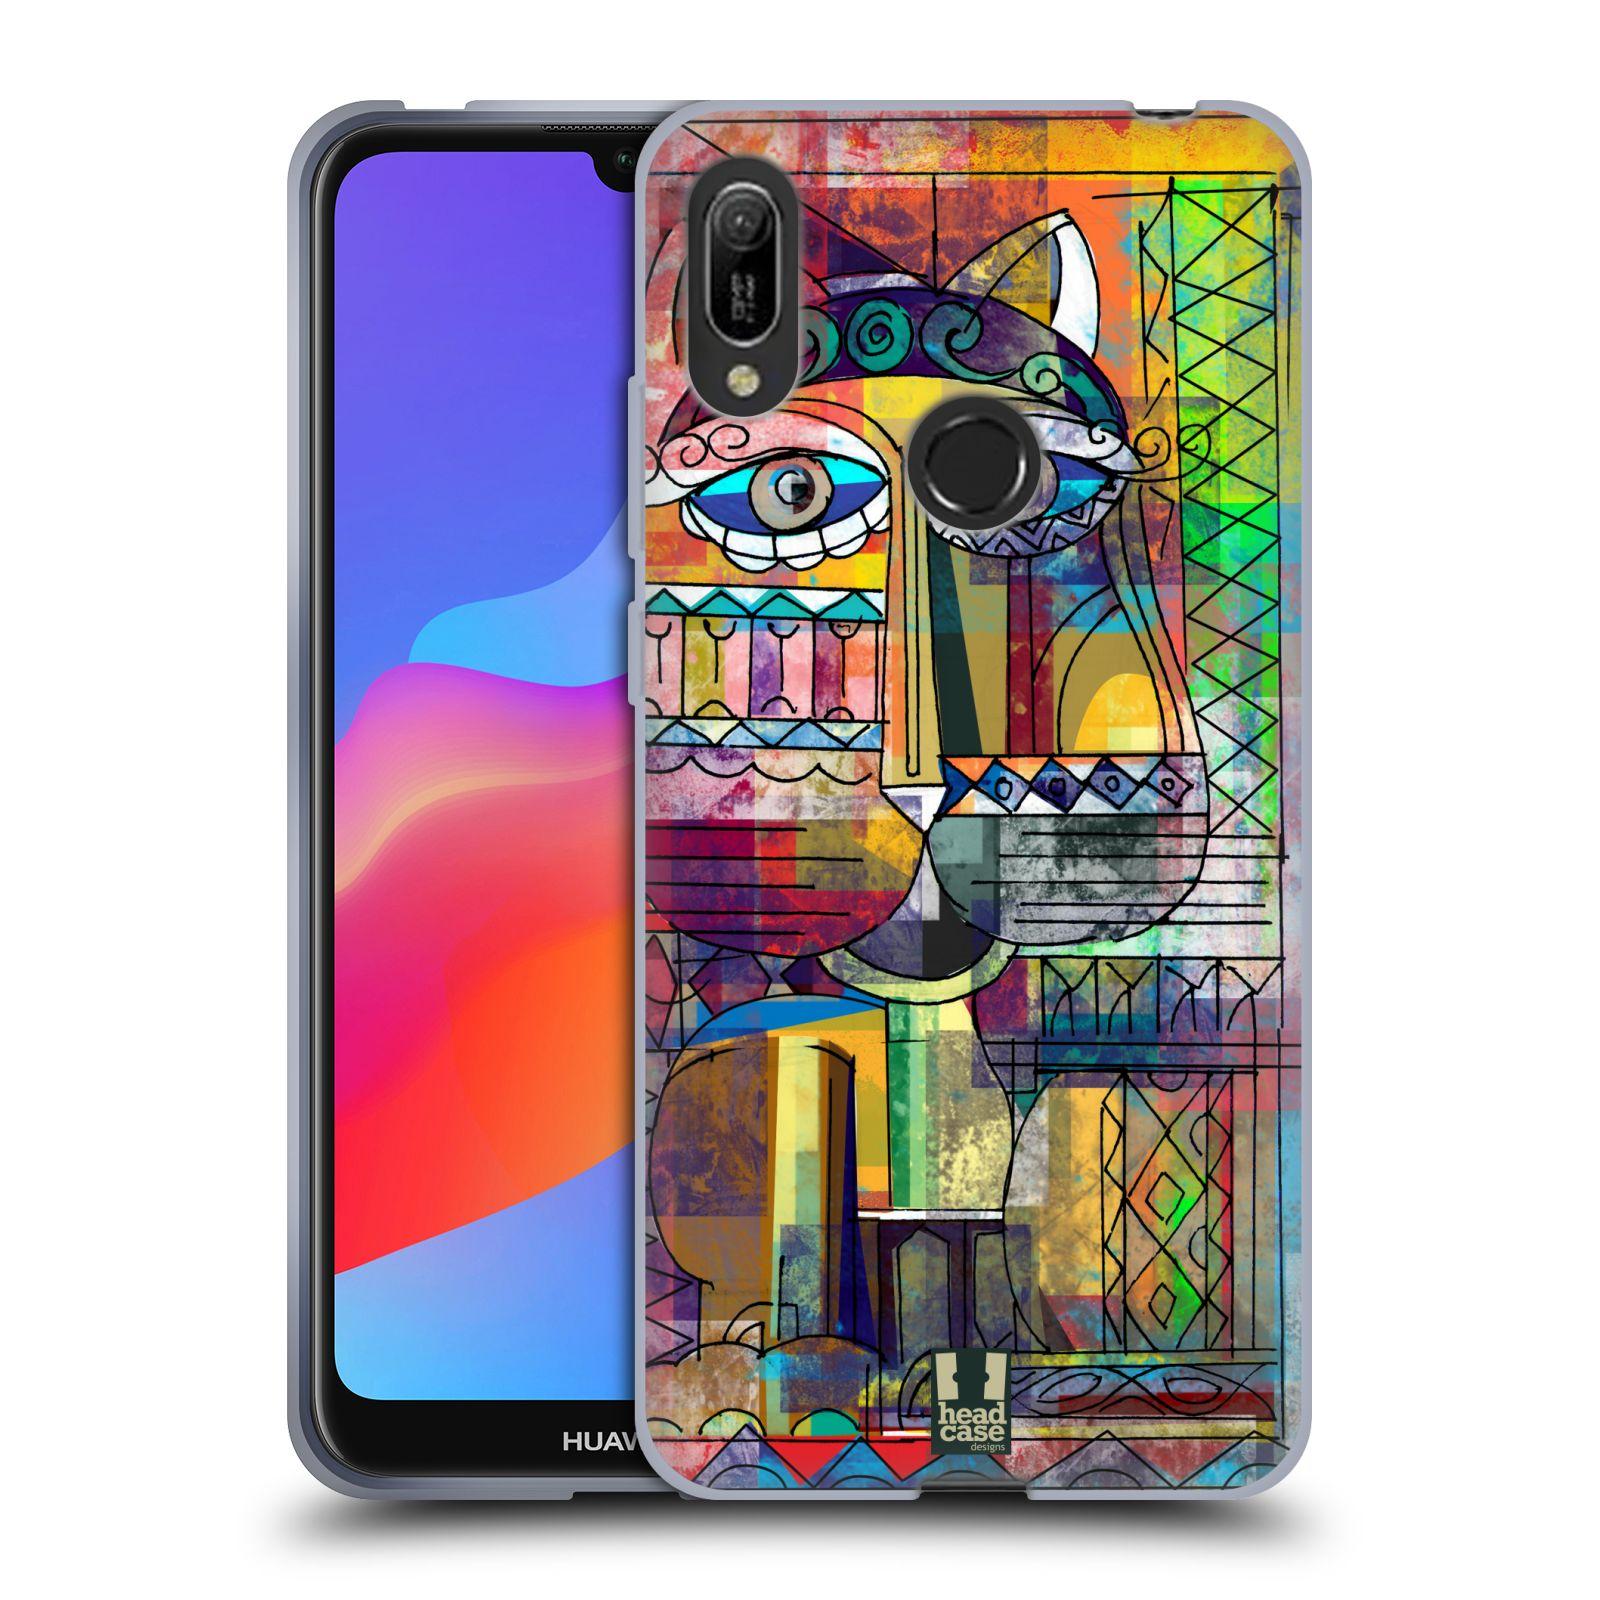 Silikonové pouzdro na mobil Huawei Y6 (2019) - Head Case - AZTEC KORAT